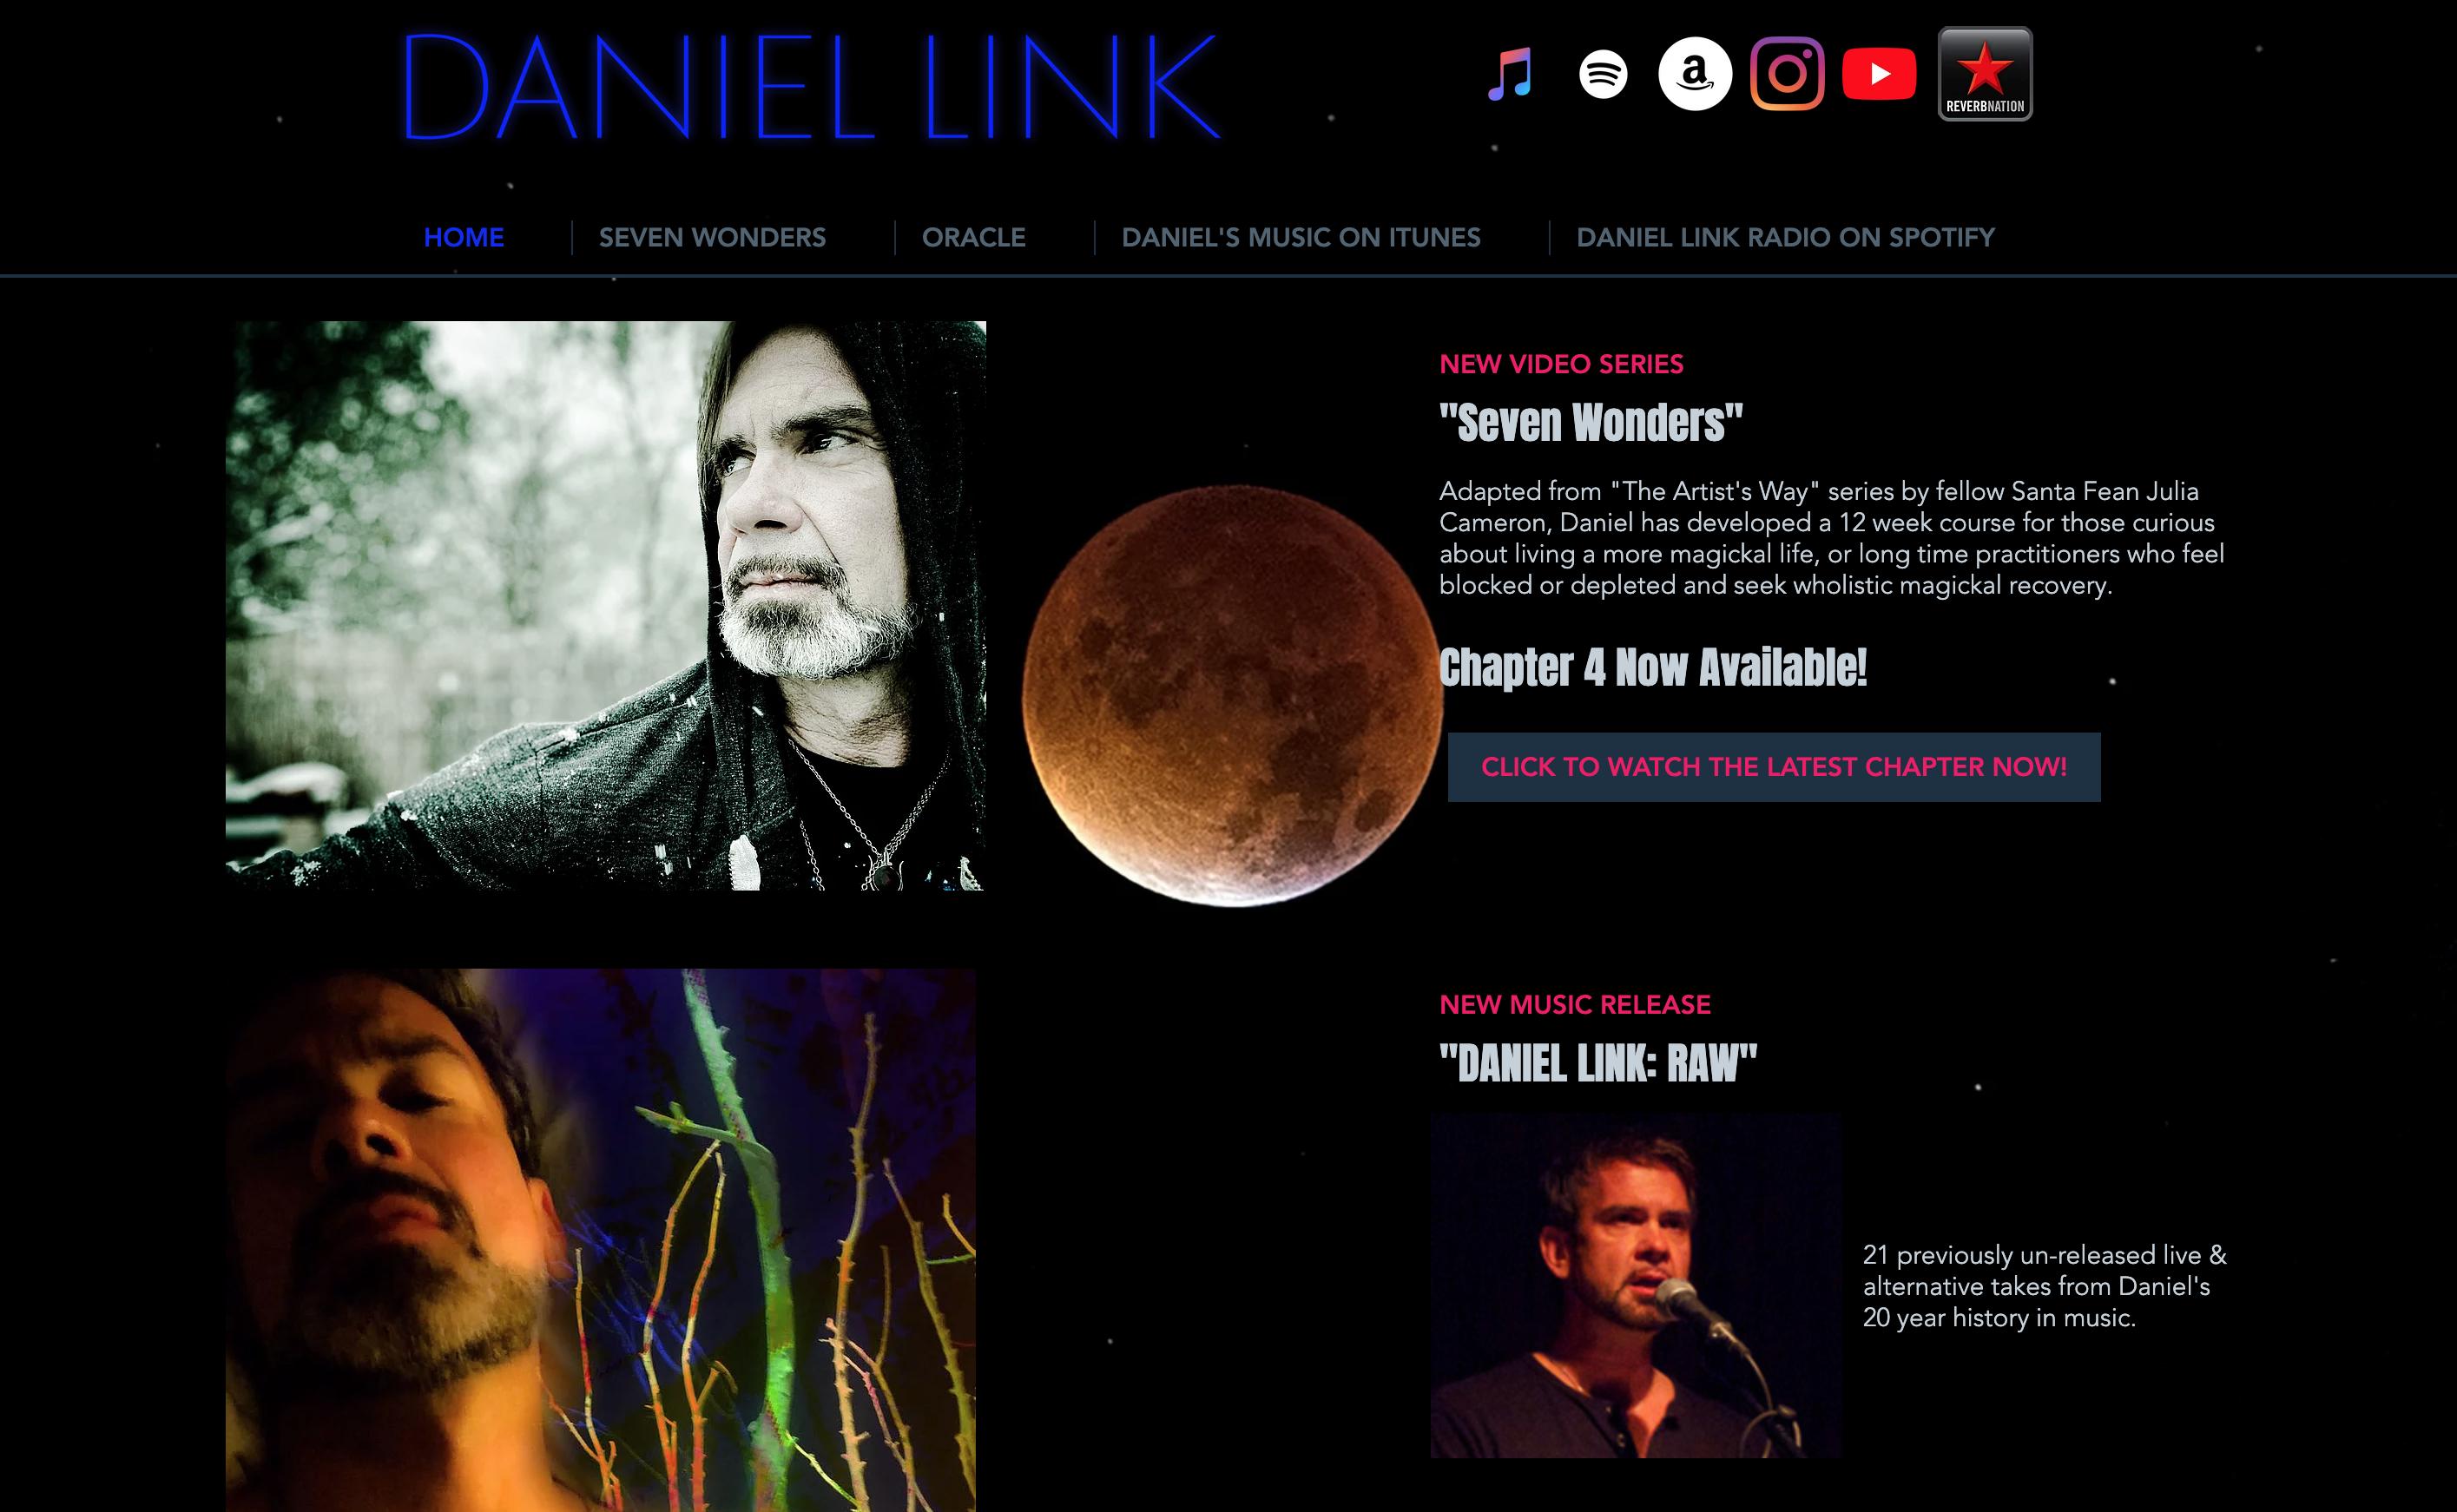 DanielLink.com, redesign, 2020